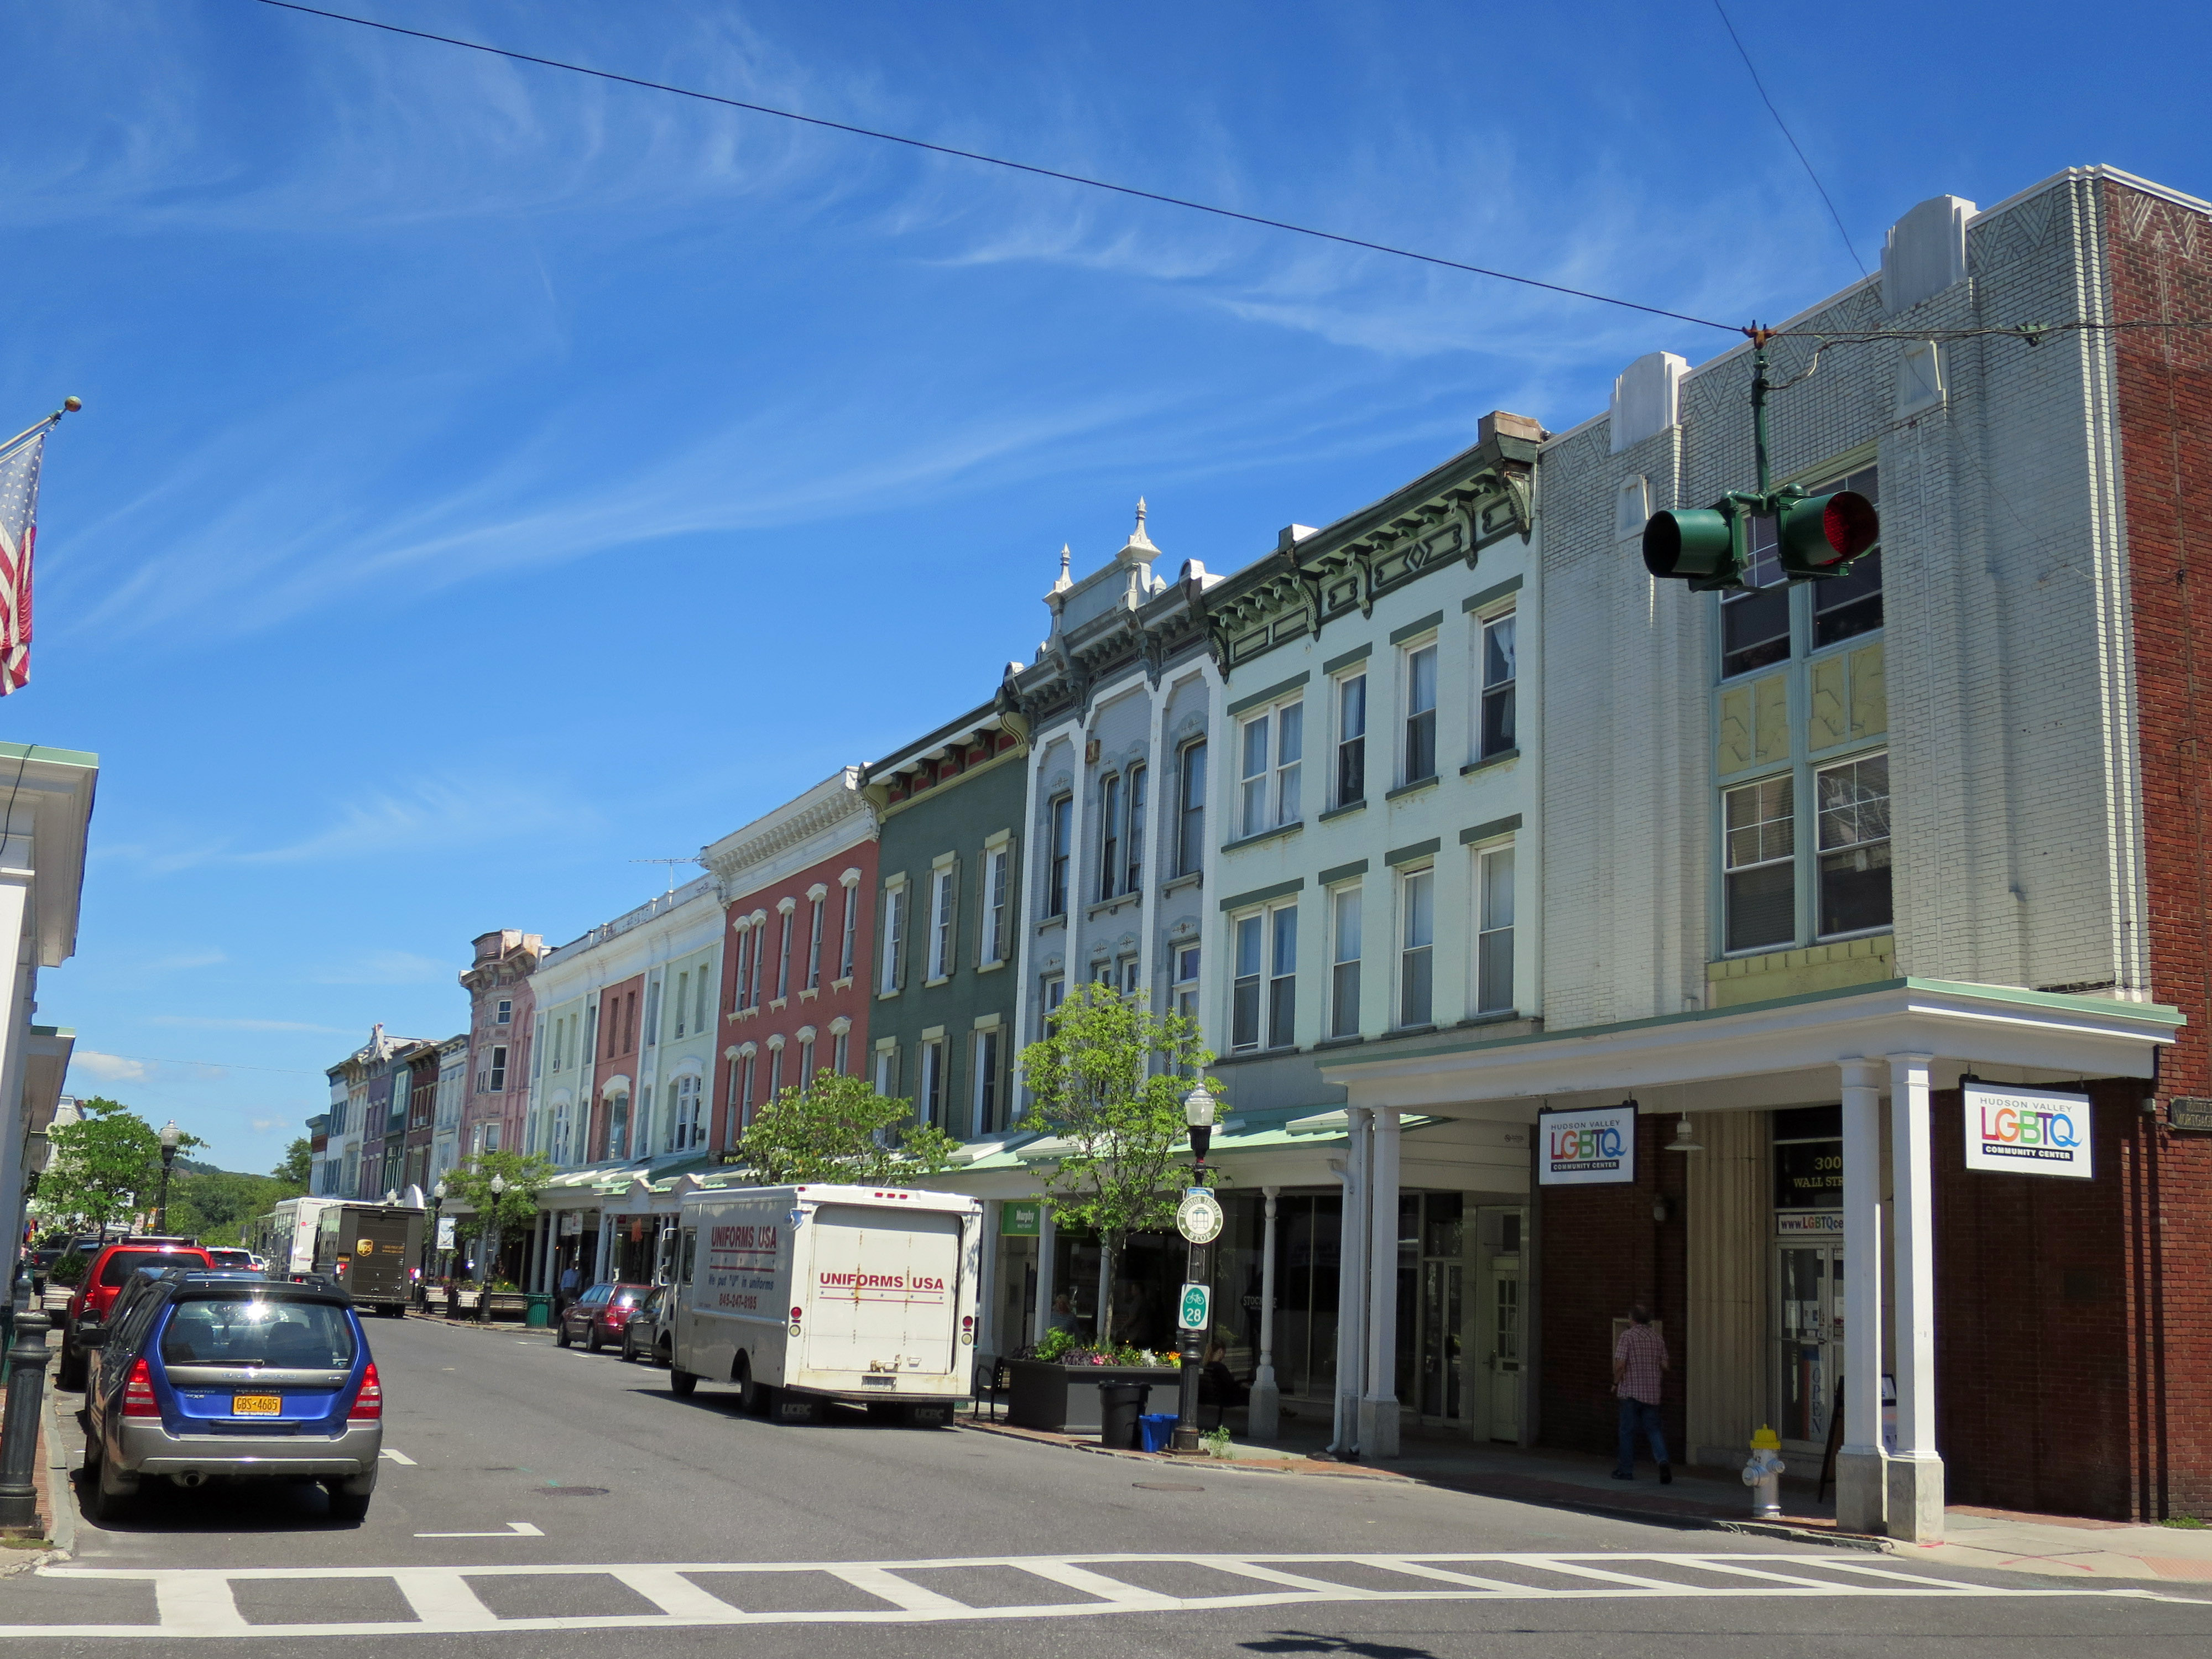 Side By Sides >> A Photo Post of Kingston, New York | Prufrock's Dilemma